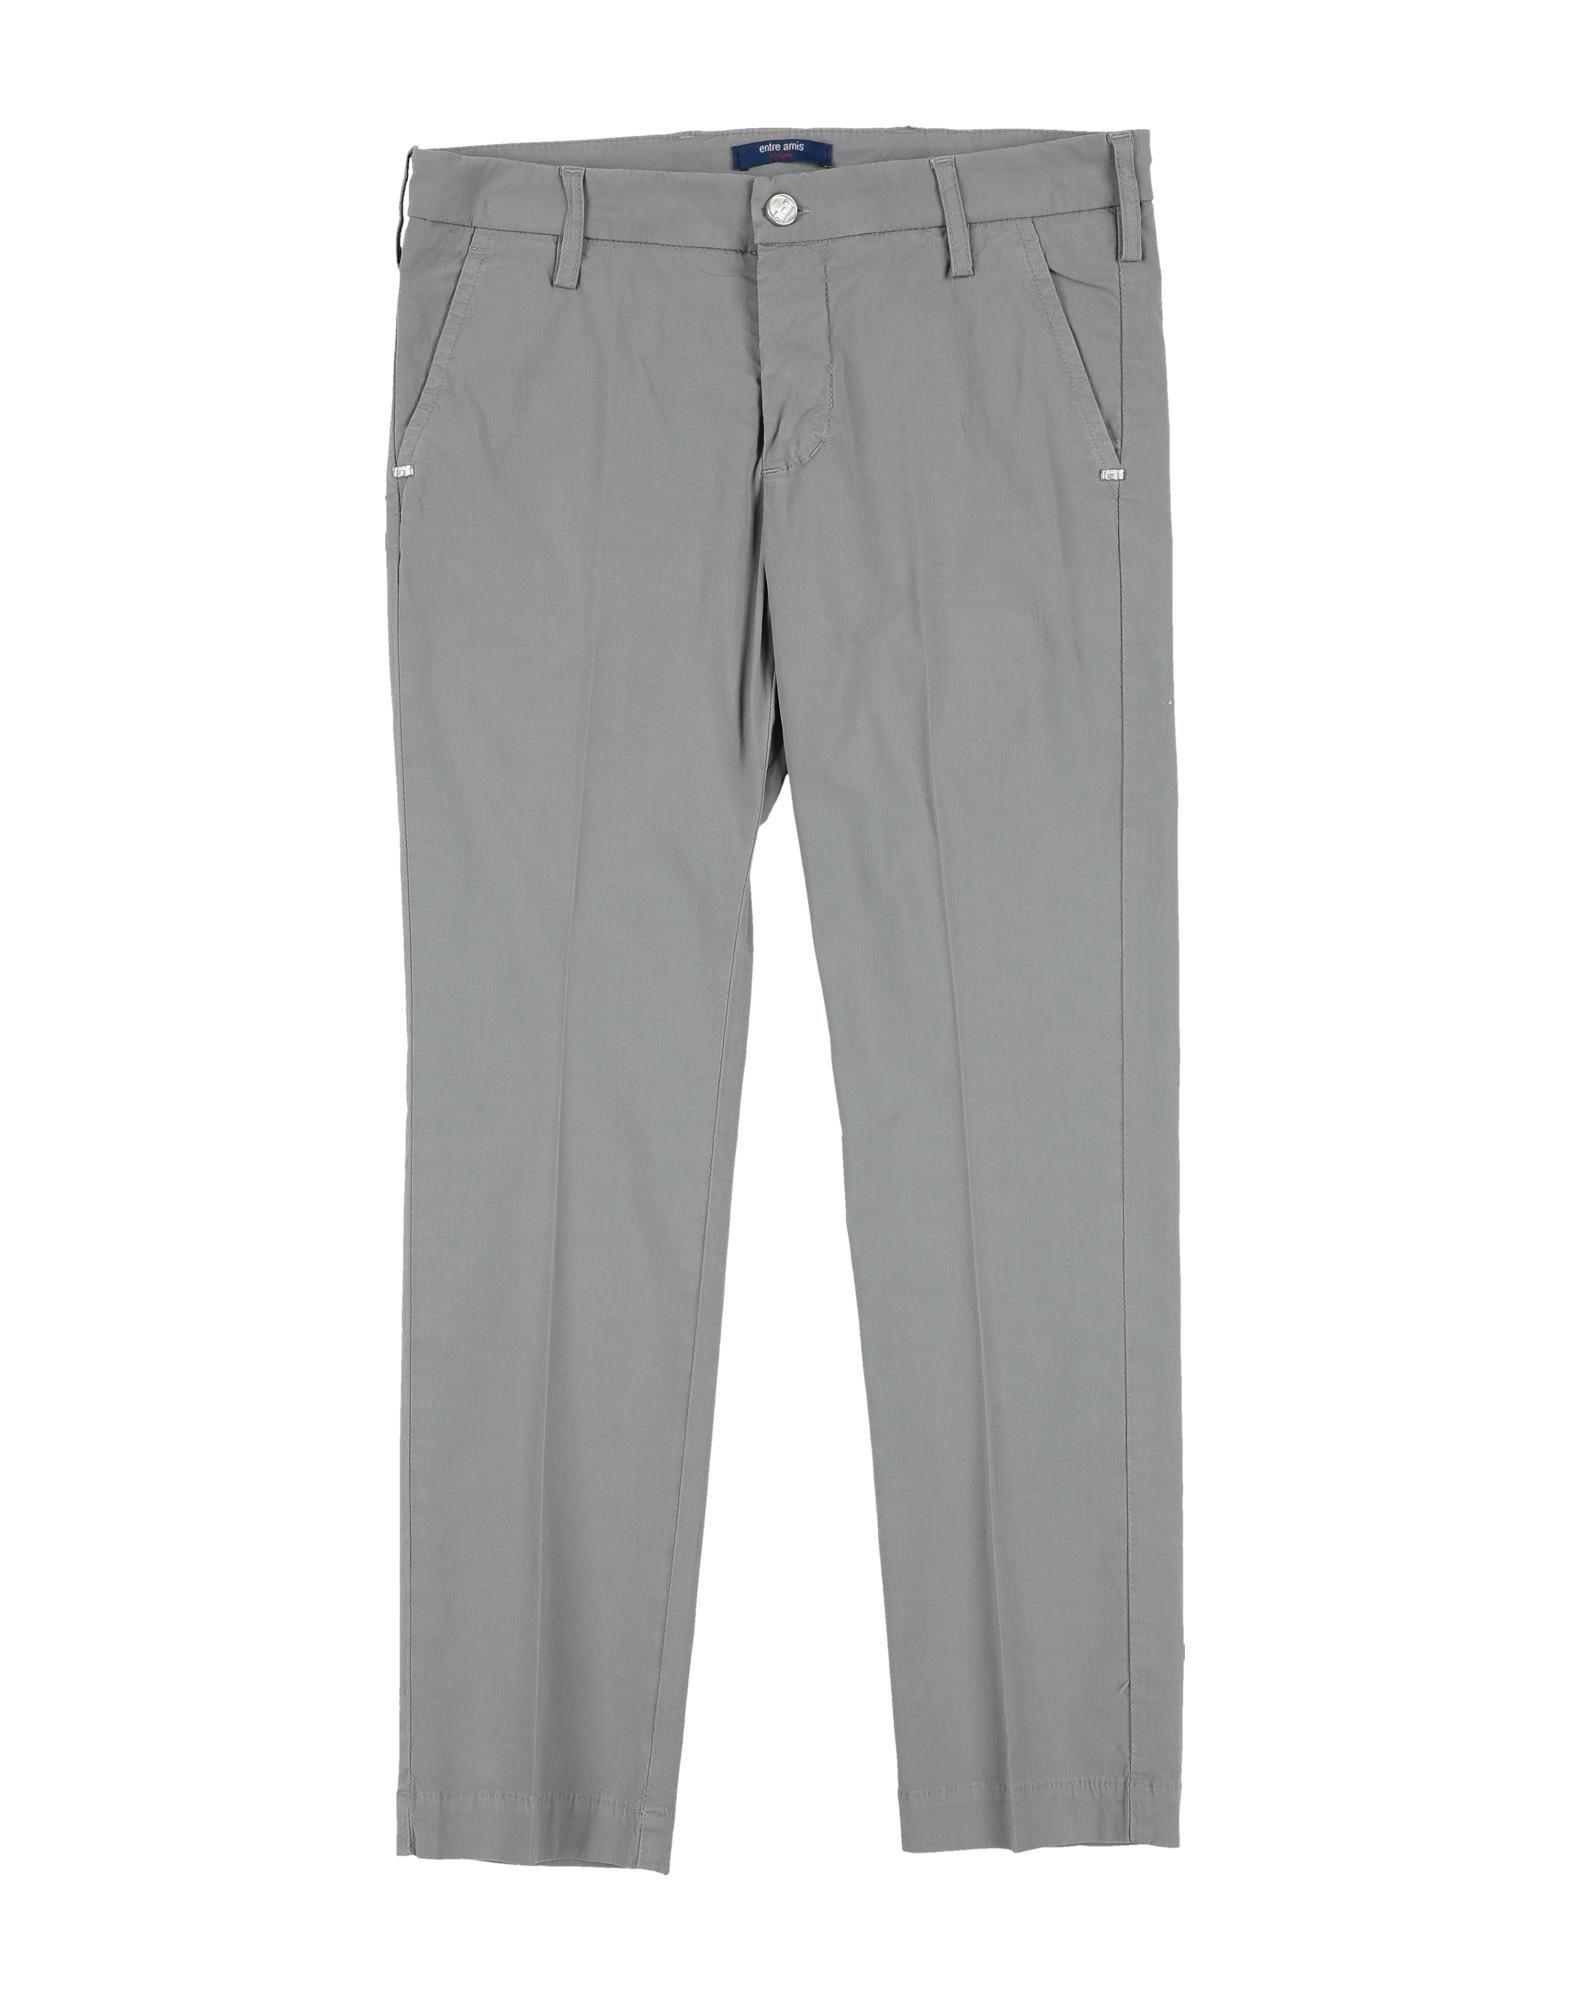 Entre Amis Garçon Kids' Casual Pants In Grey